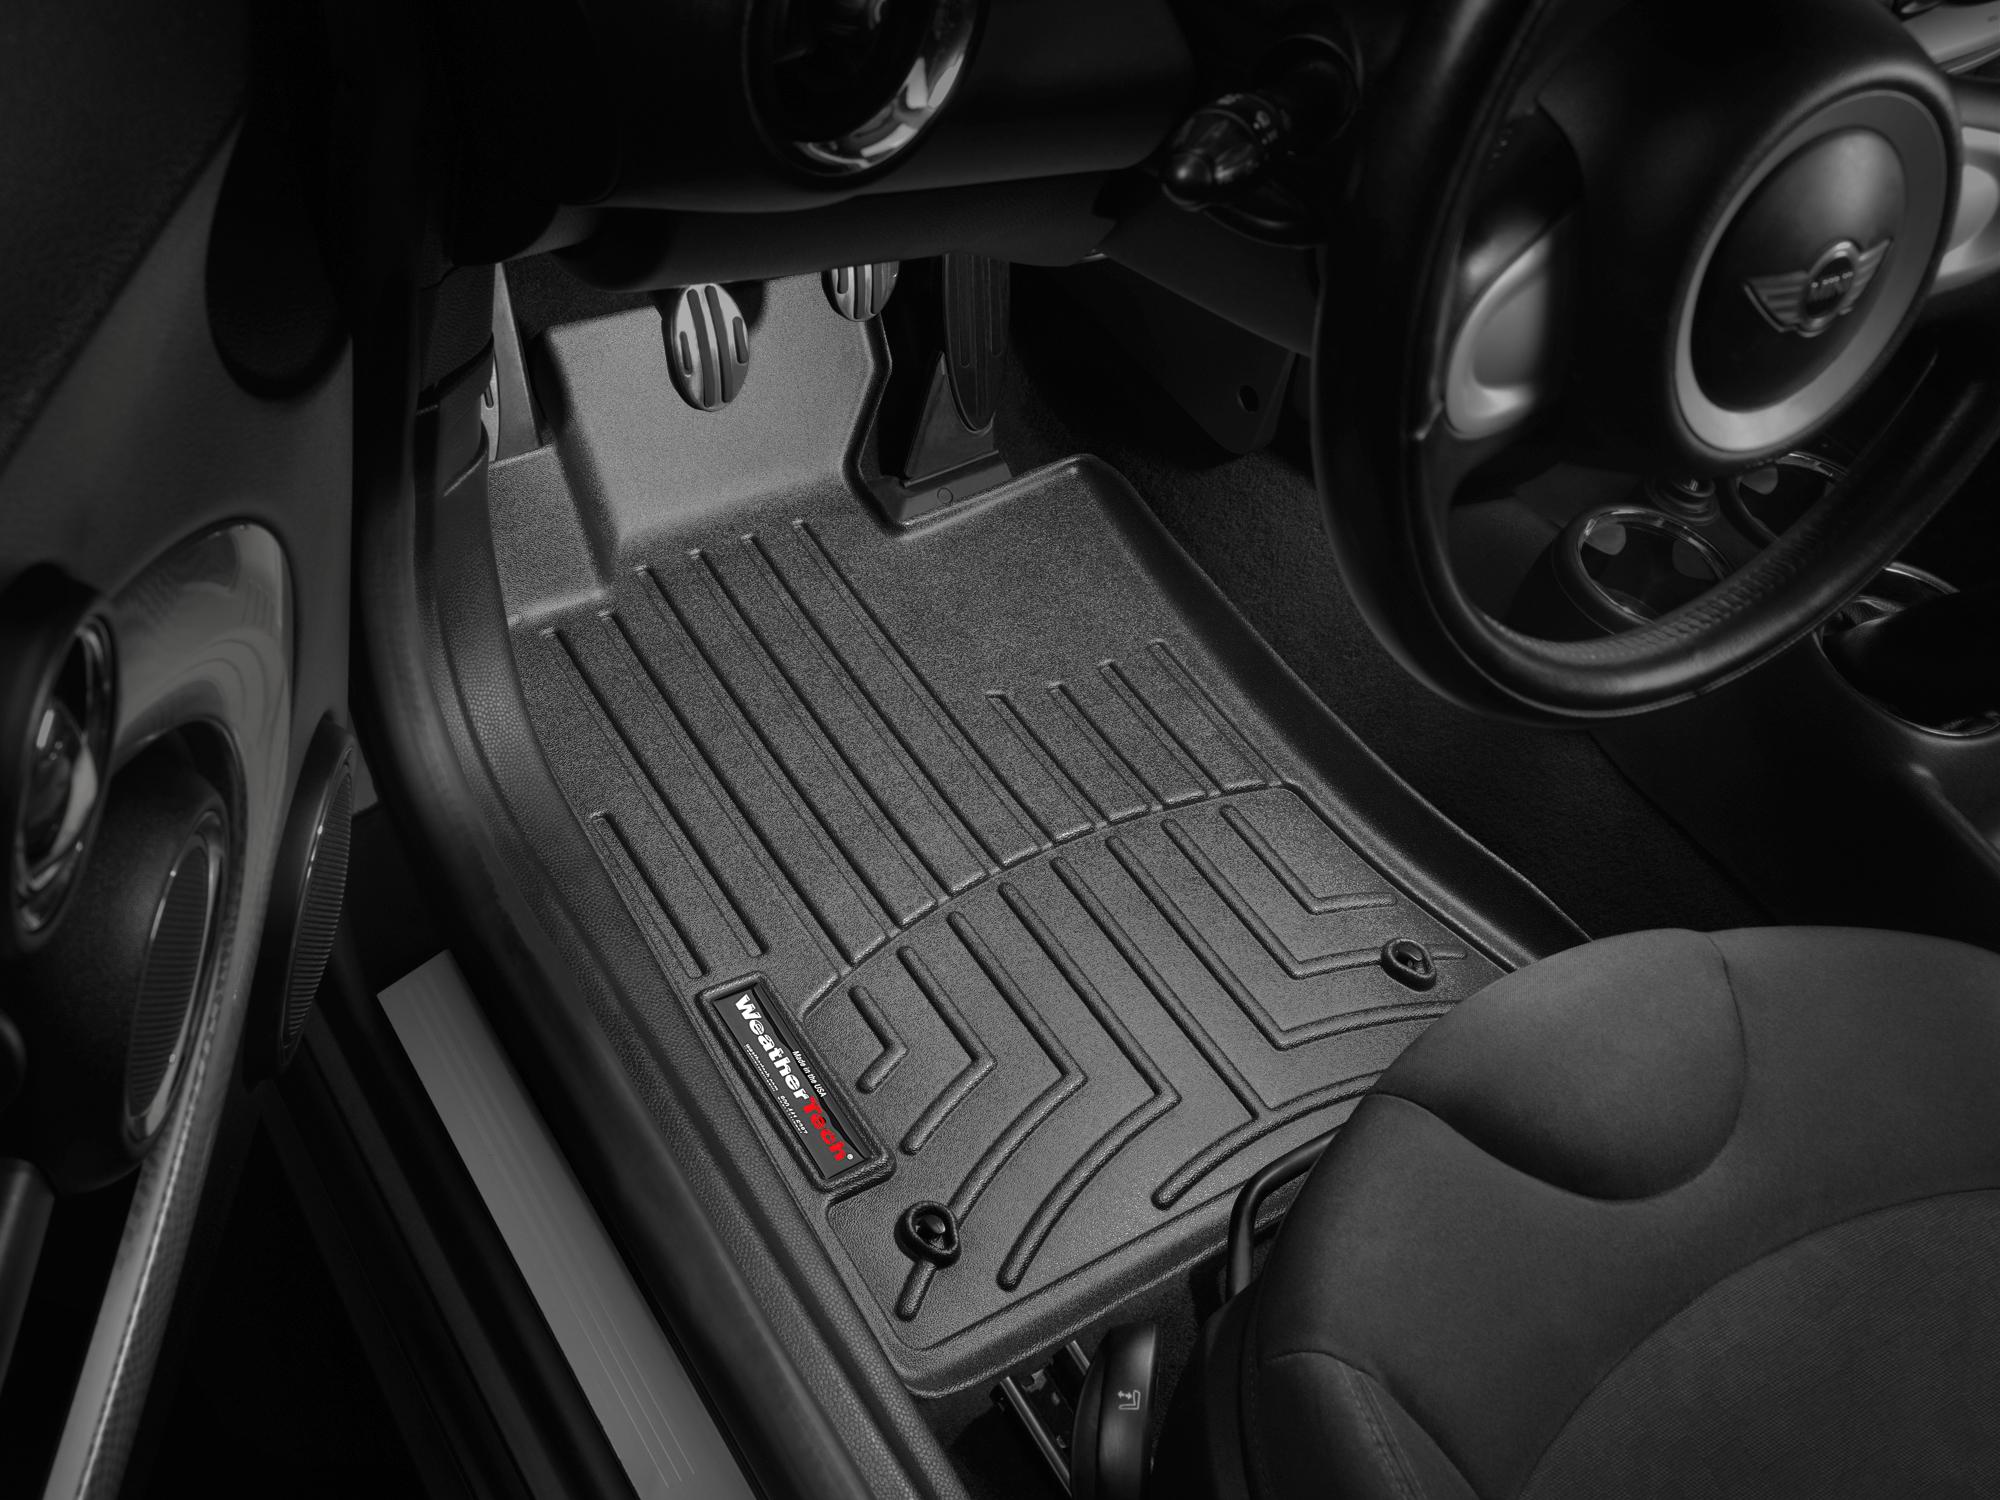 Tappeti gomma Weathertech bordo alto MINI Coupe 12>15 Nero A2710